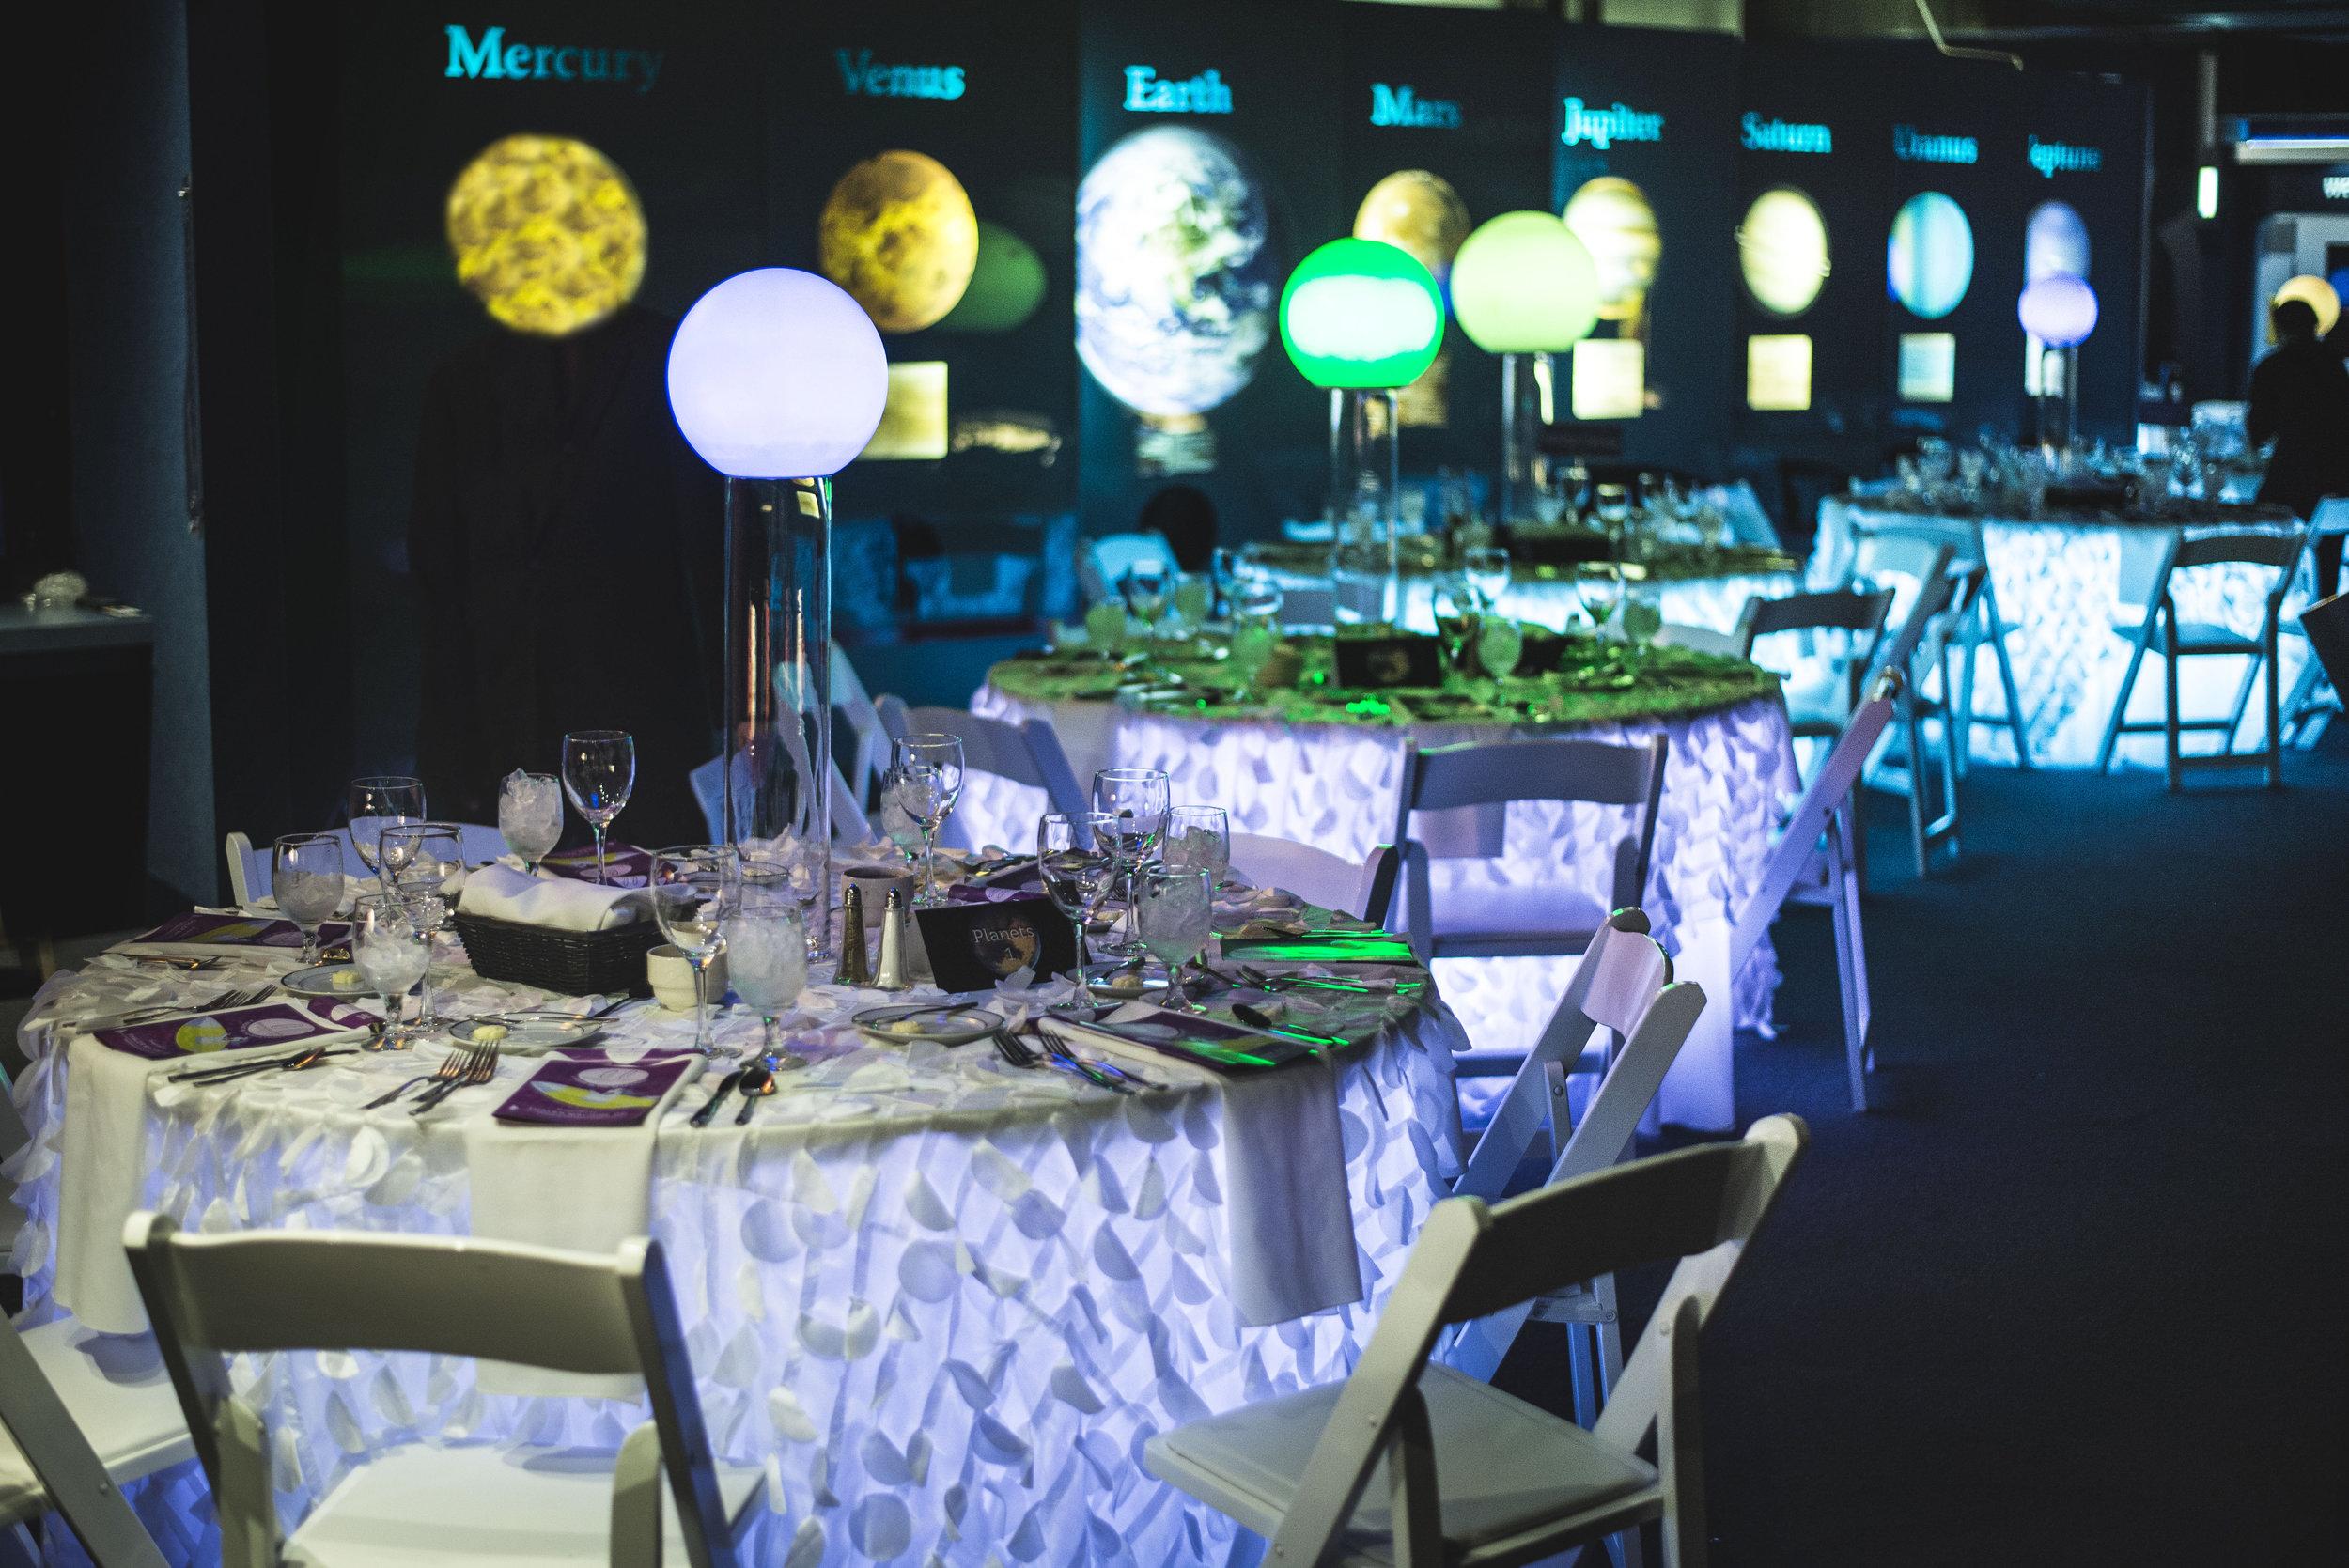 boonshoft-museum-dayton-wedding-reception-banquet-rental-elite-catering_008.jpg